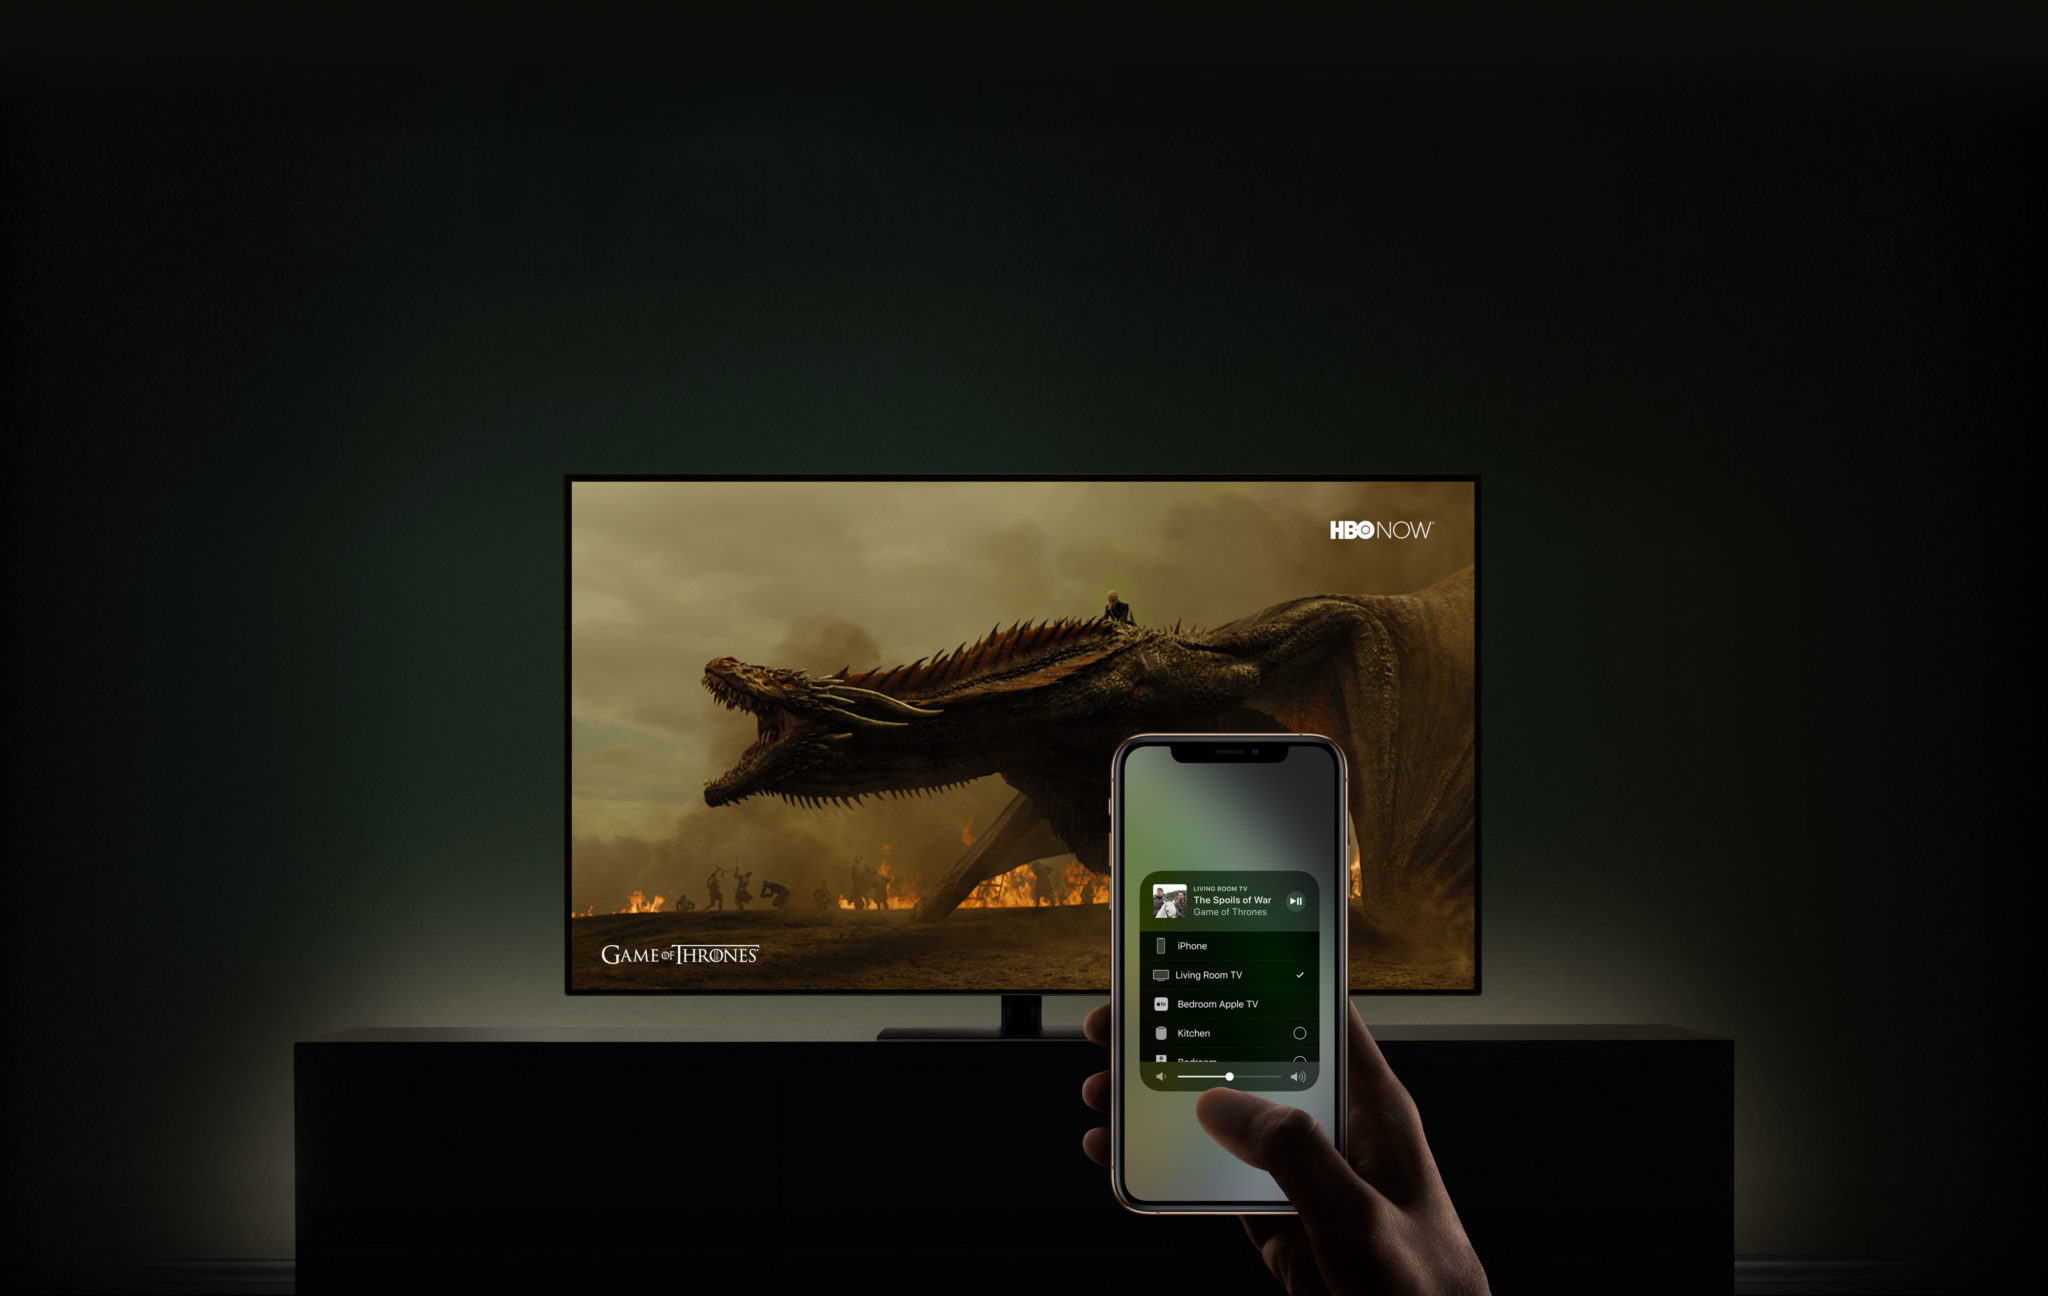 airplay iphone tv gameofthrones - Zhrnutie: To najlepšie z CES 2019